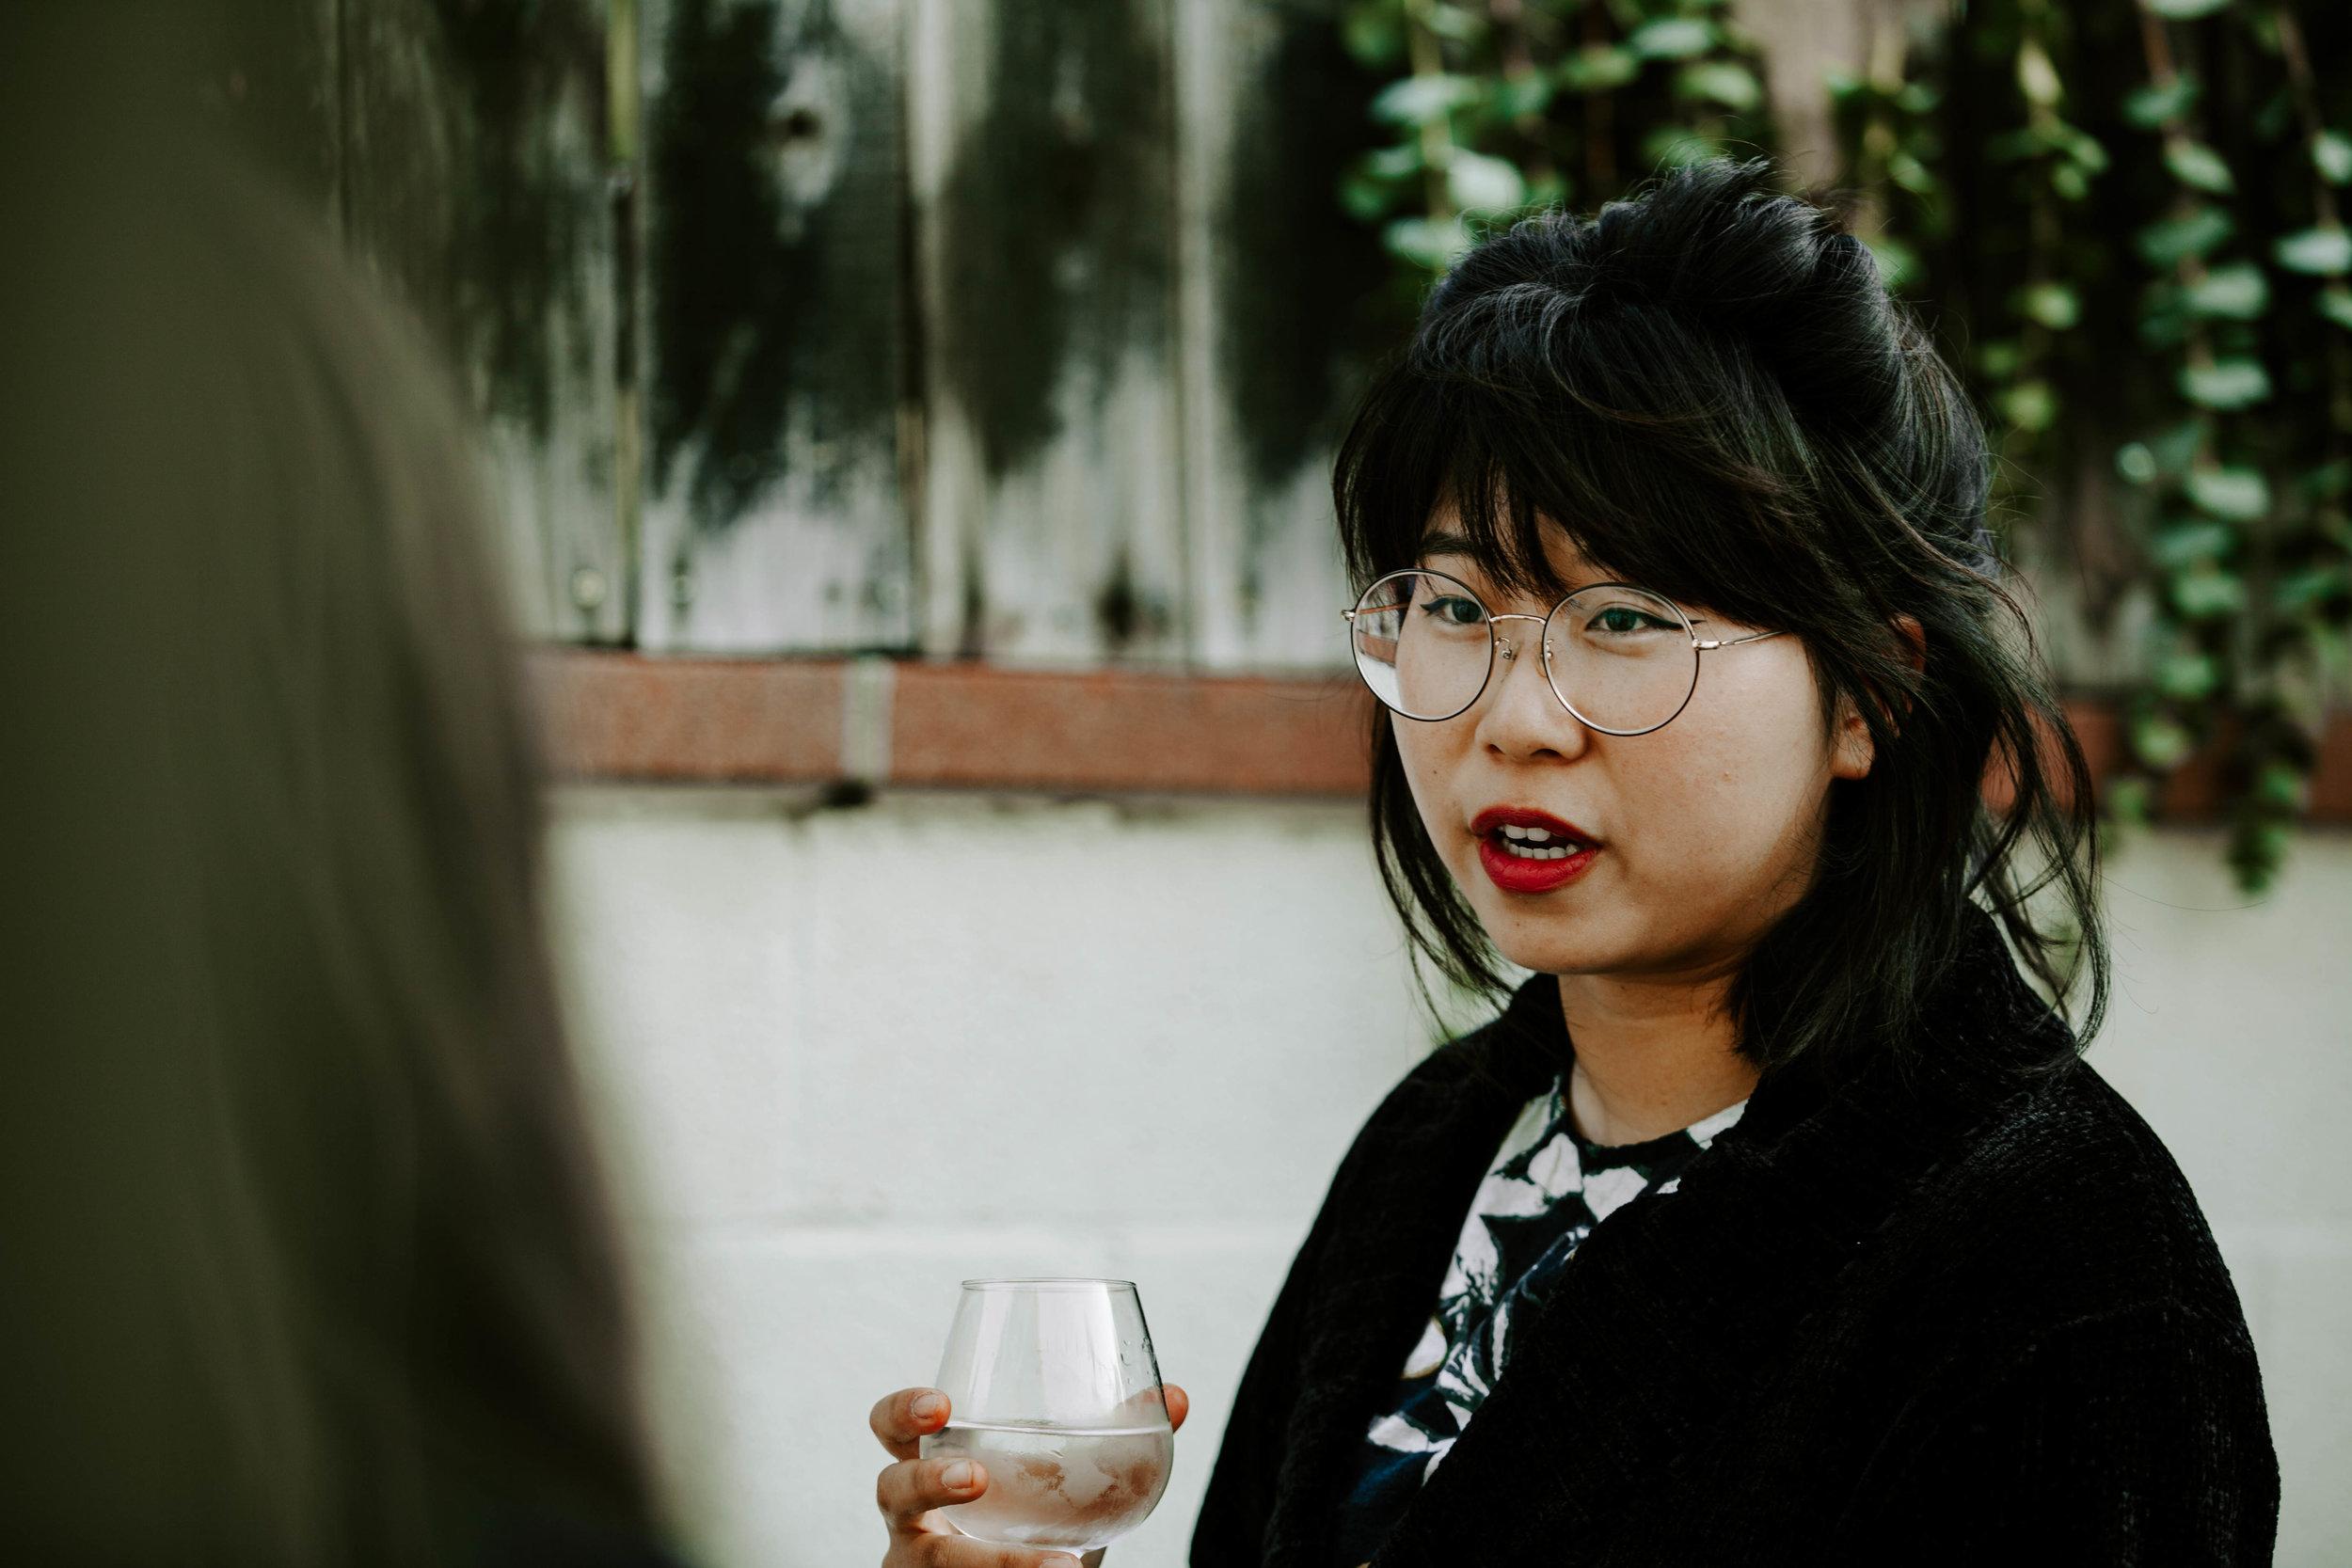 At The Lane + Tori Schaulis -Conversation Around The Table--162.jpg